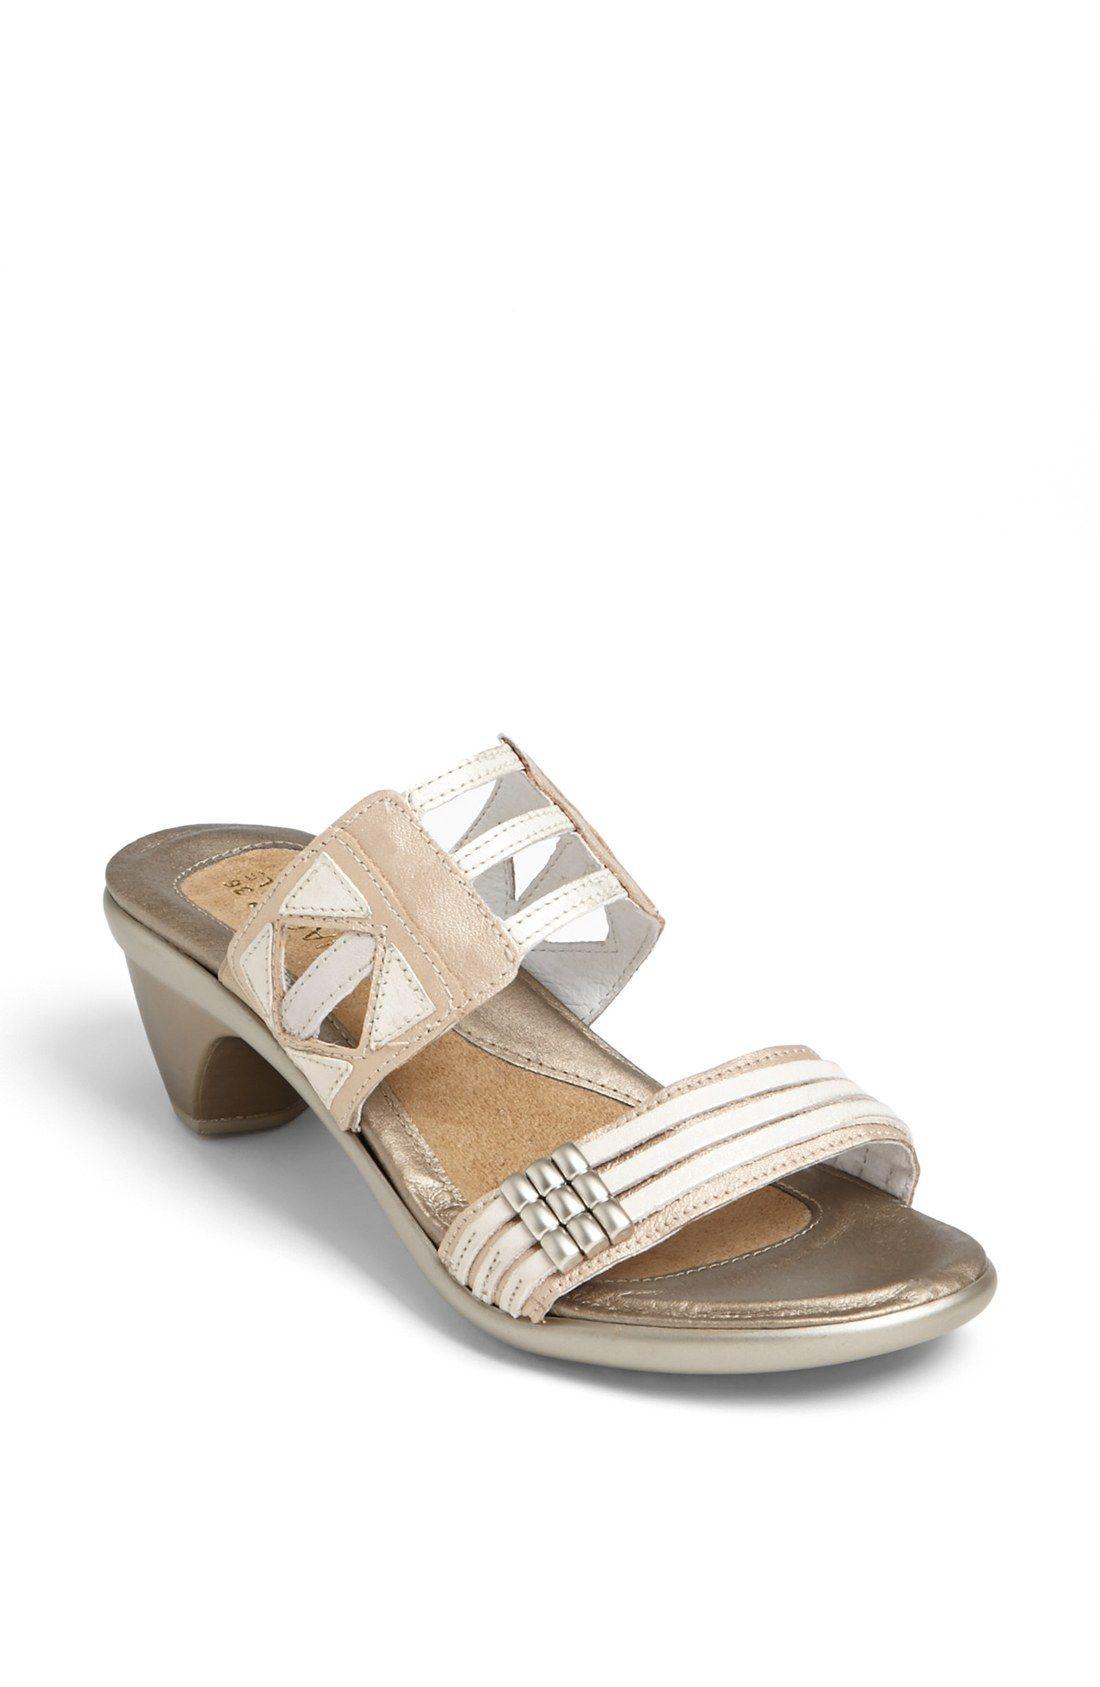 ec4308ddbea4 Naot  Afrodita  Sandal